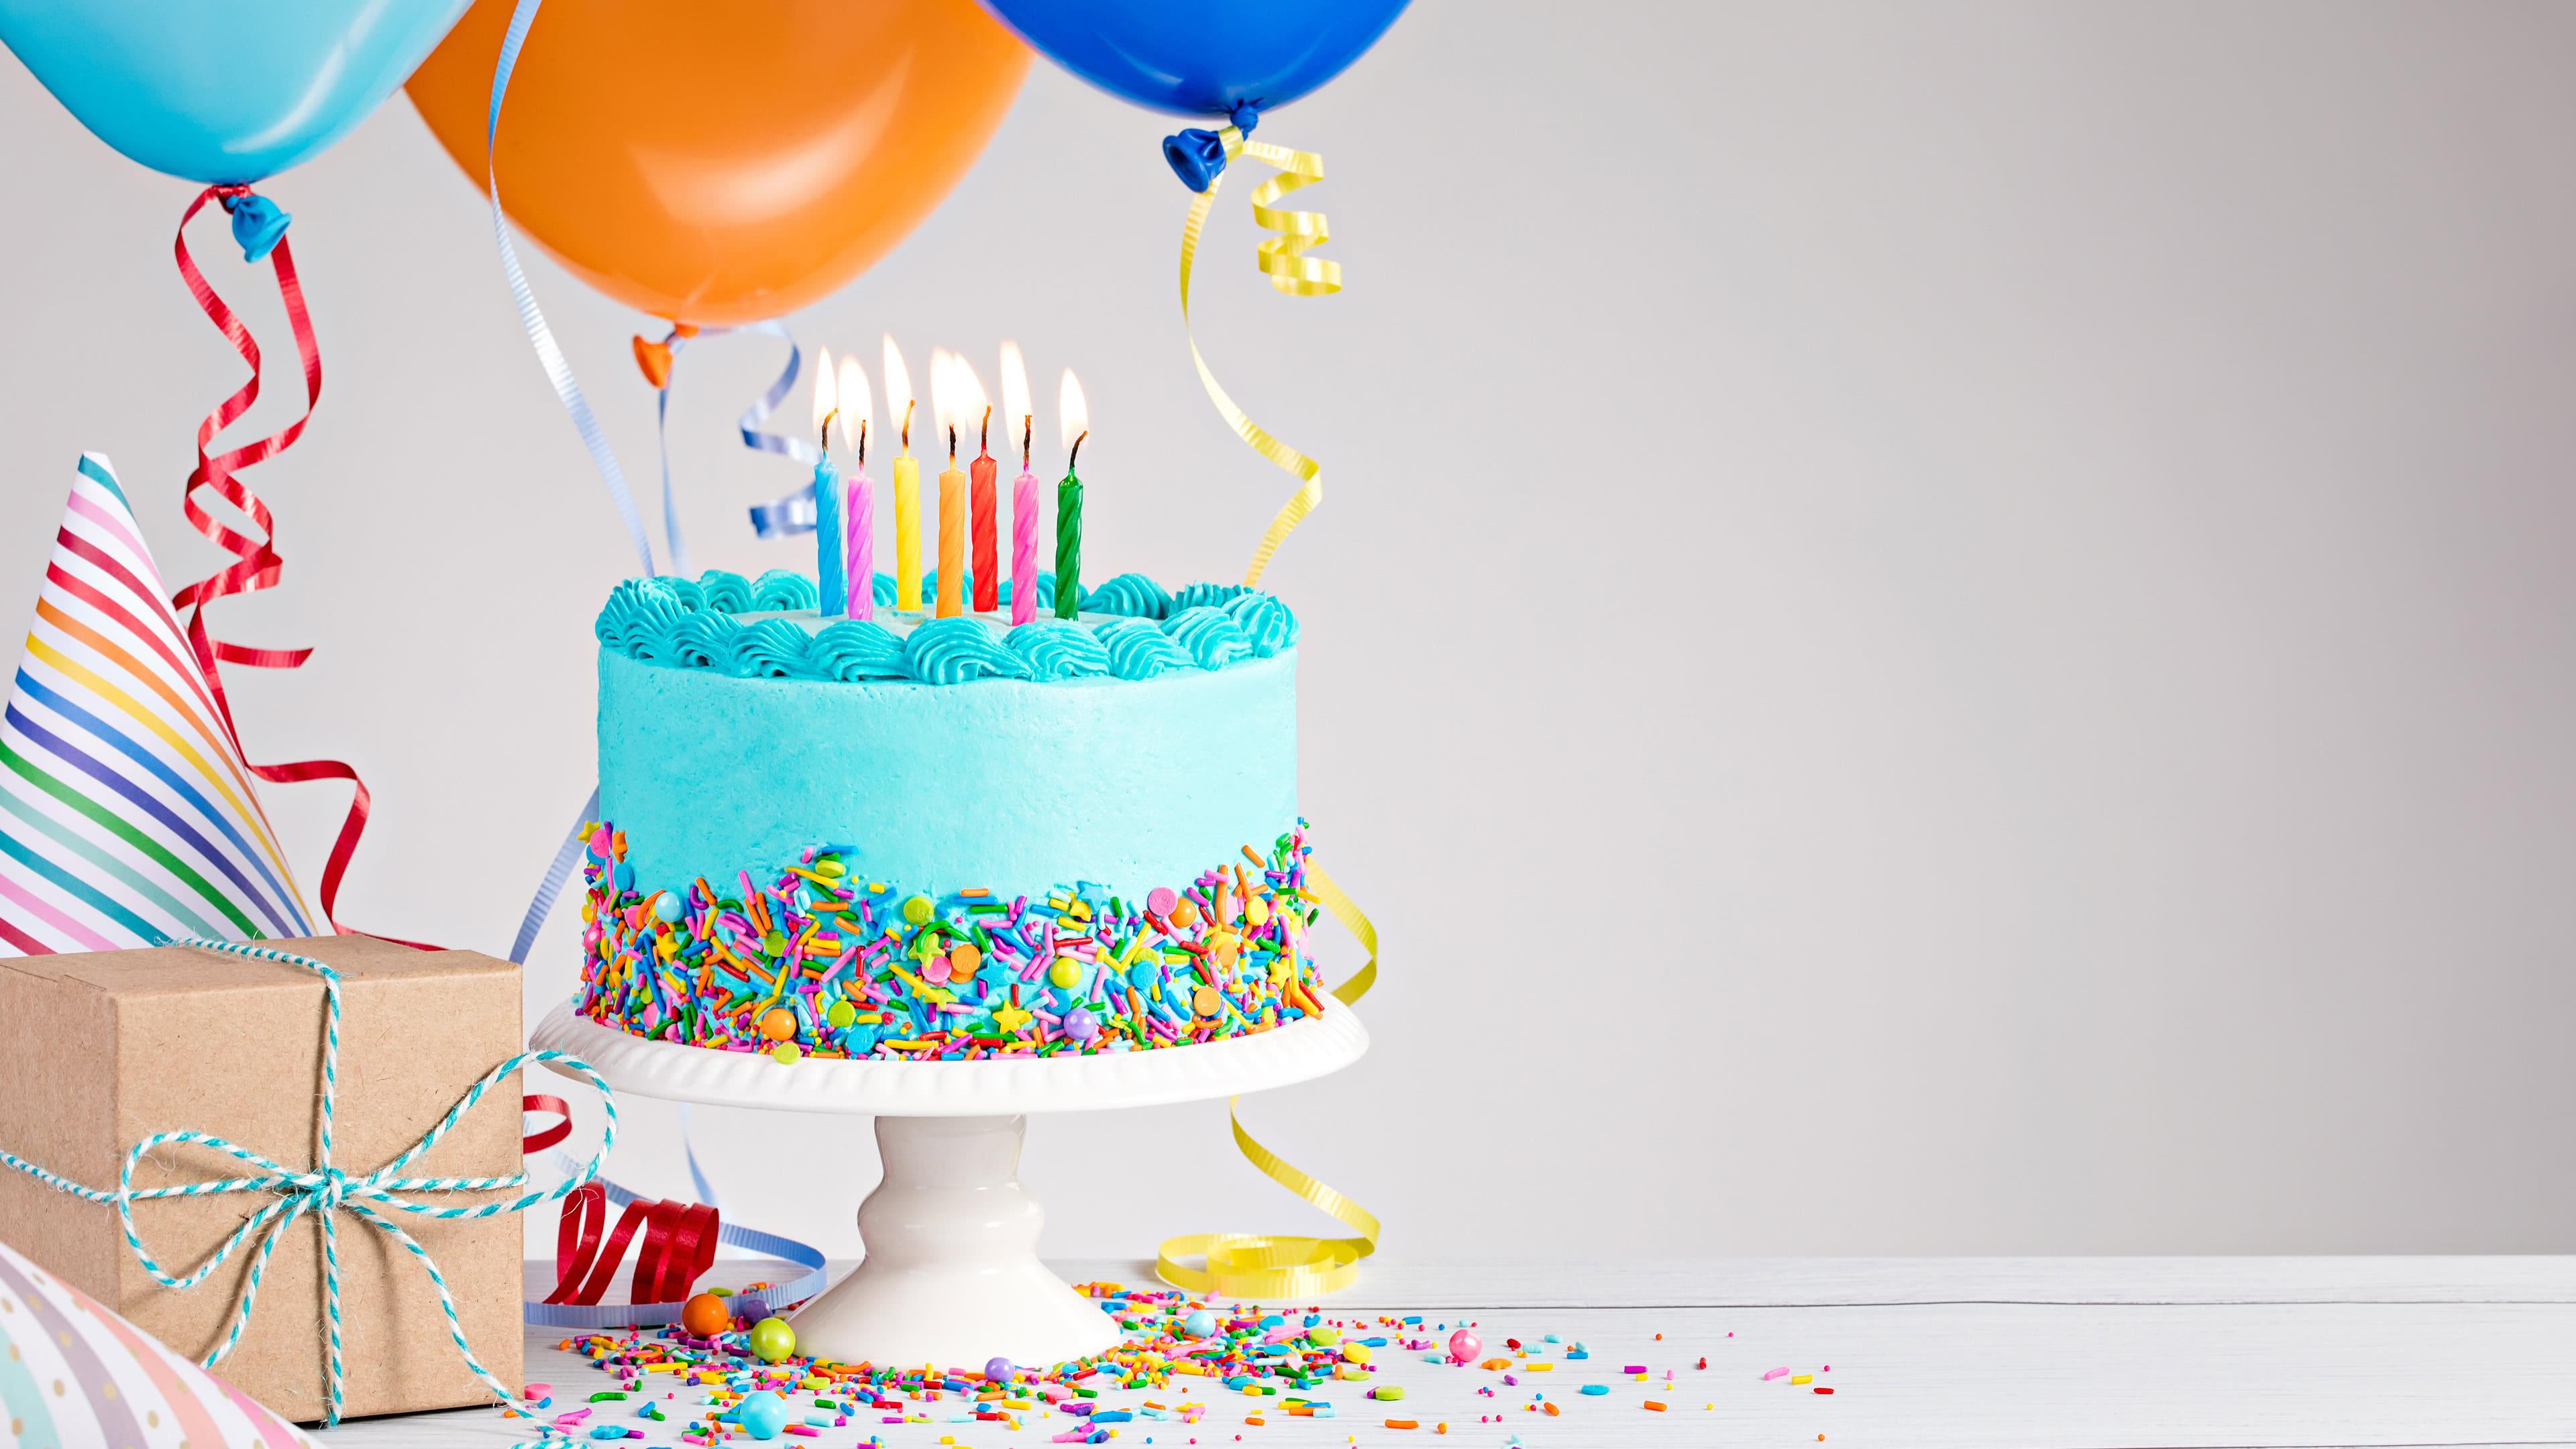 Birthday Cake And Balloons Uhd 4k Wallpaper